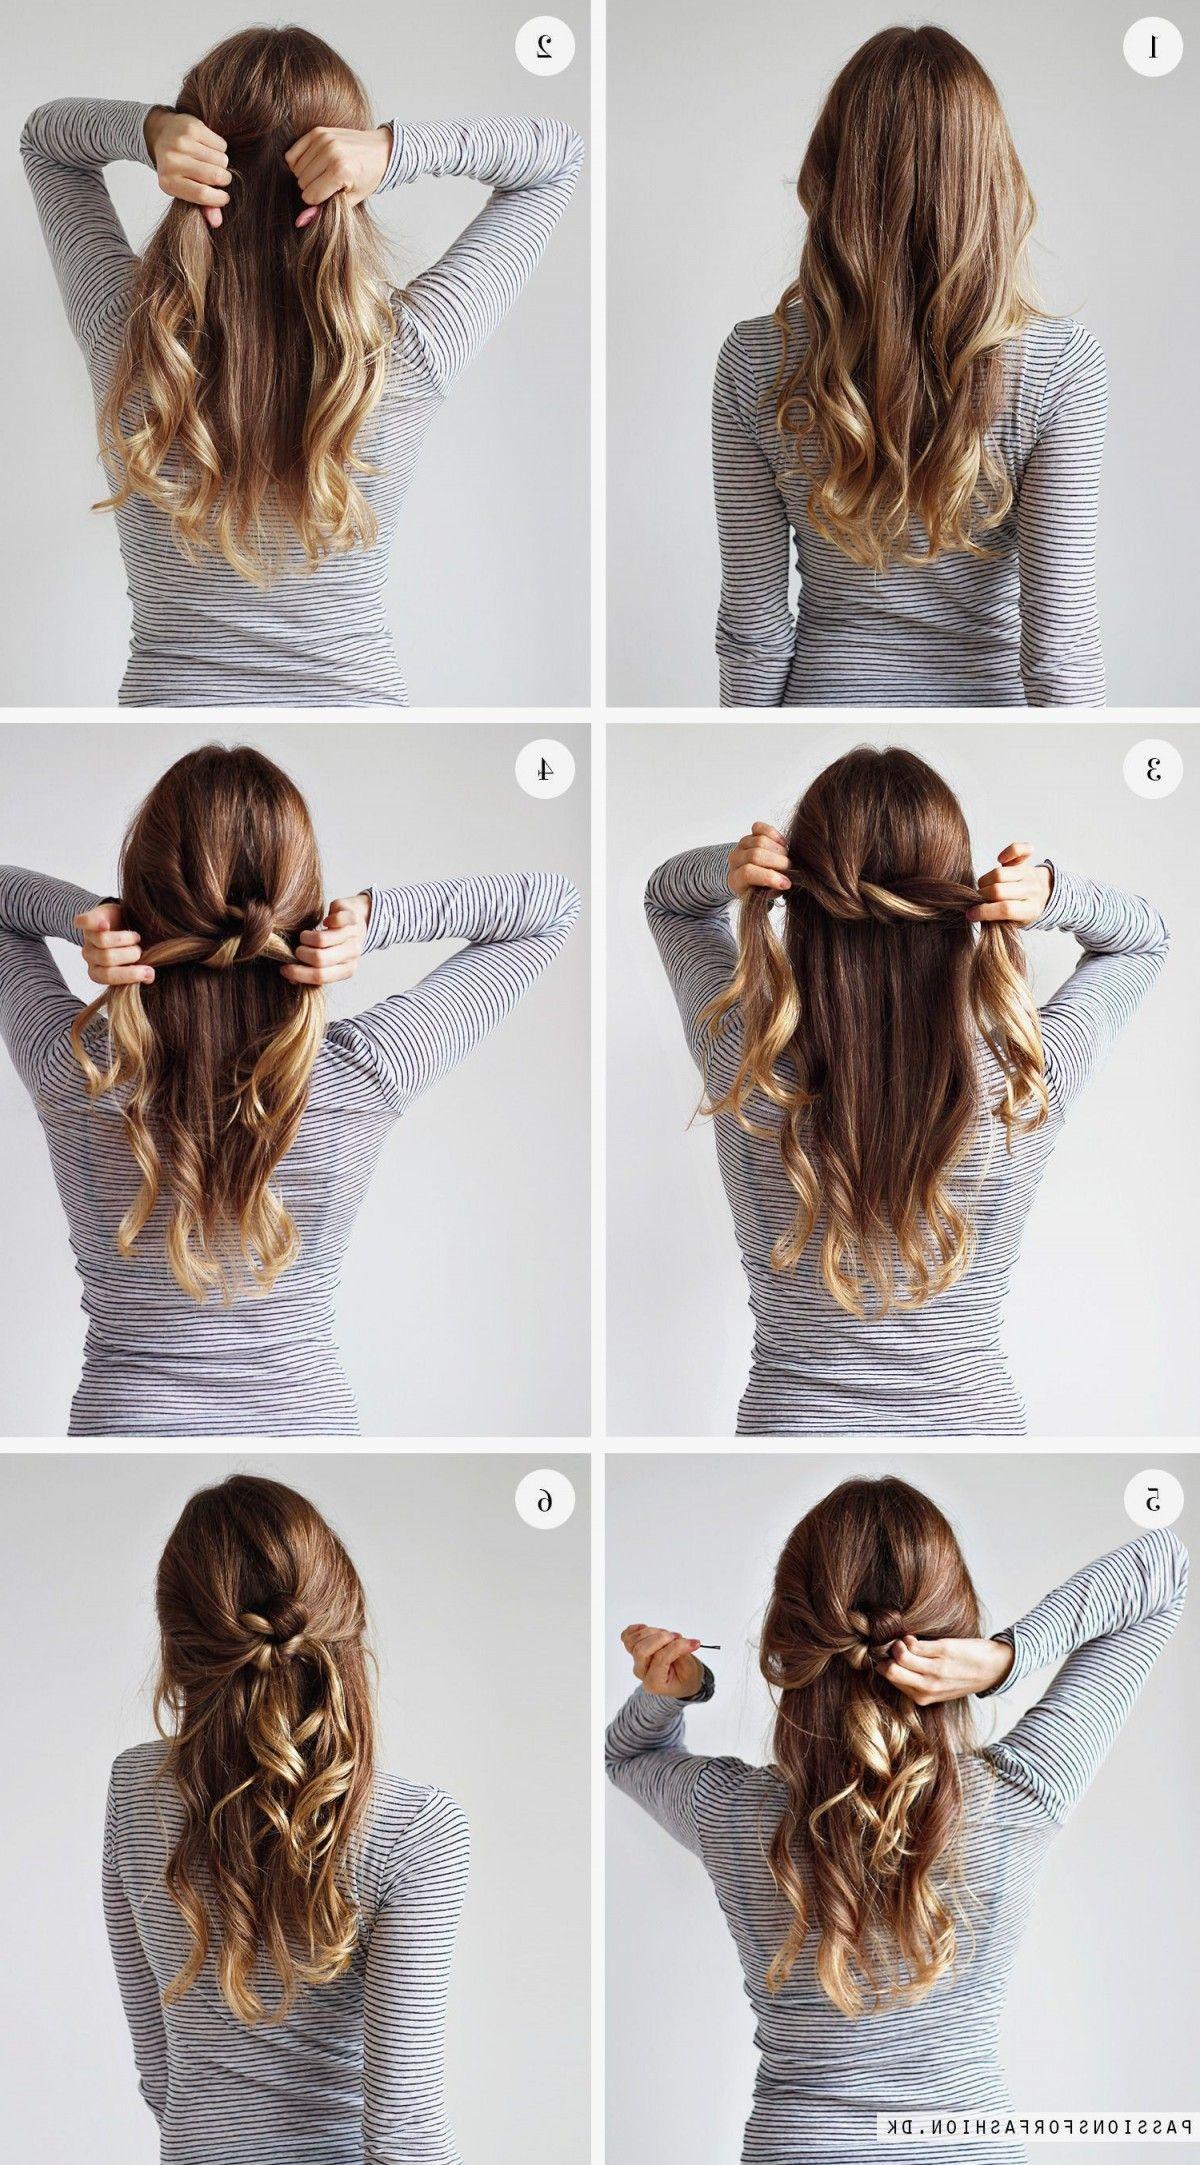 Beautiful Halboffene Frisuren Selber Machen Frisuren Lange Haare Halboffen Dirndl Frisuren Offene Haare Frisuren Offene Haare